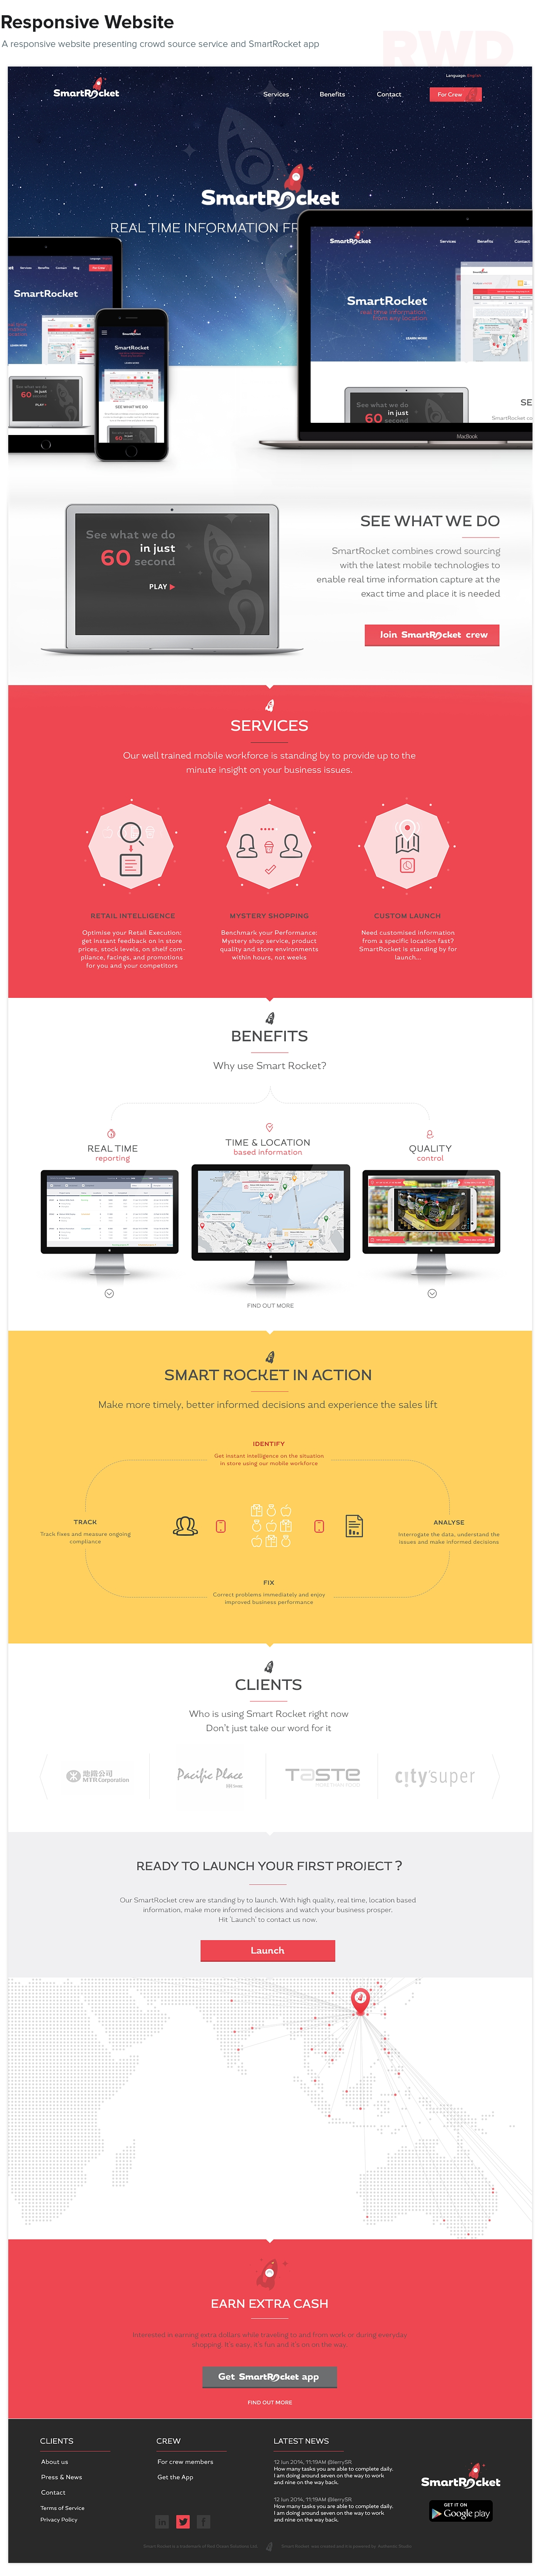 https://media.authentic-studio.com/web-content/uploads/2020/11/logo-and-responsive-web-design-for-smart-rocket-example-5.jpg